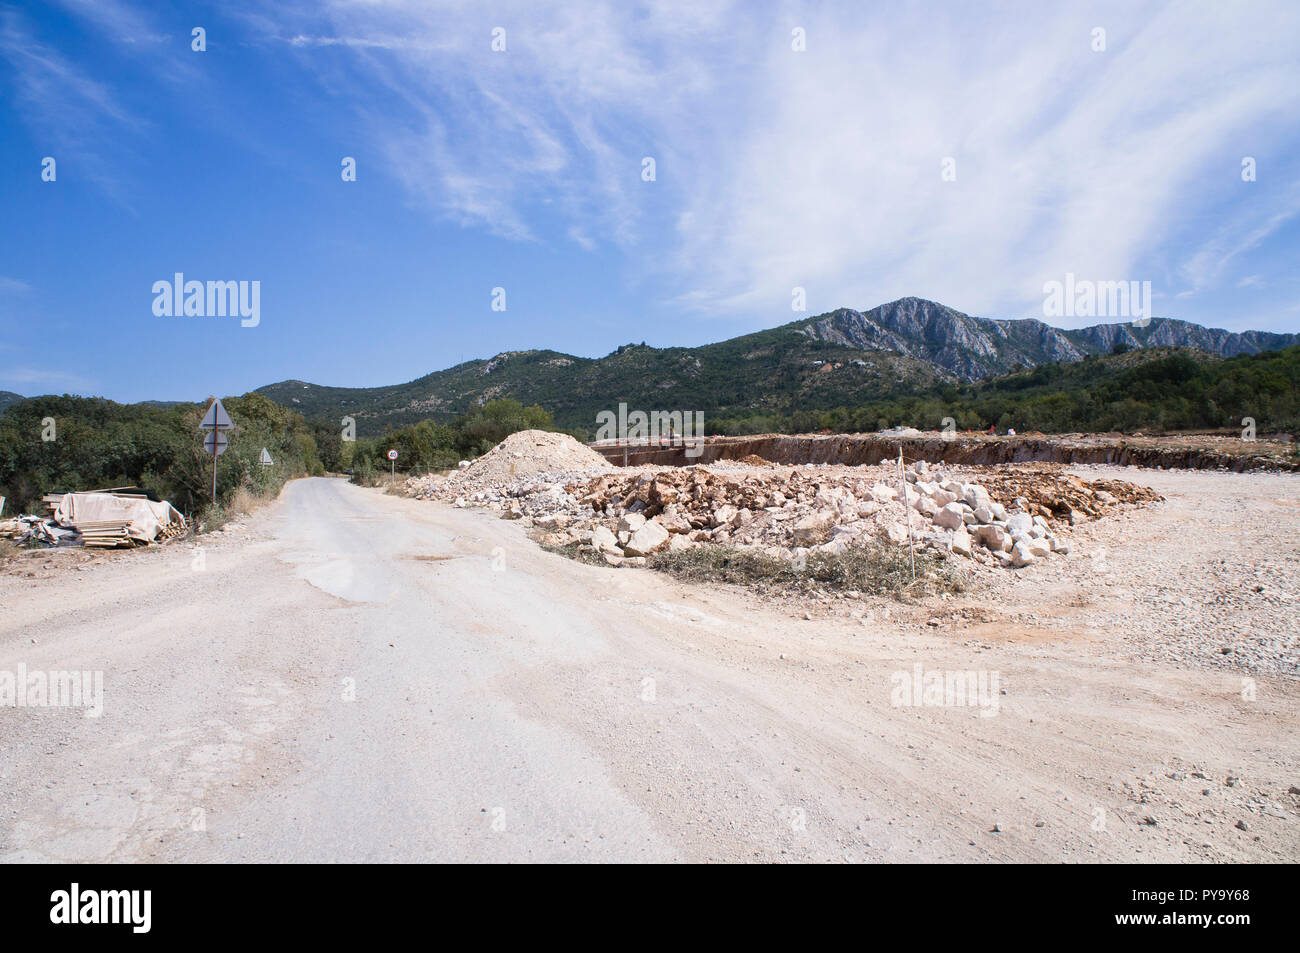 The Bar-Boljare motorway in Montenegro, build by China Road and Bridge Corporation (CRBC), represents the Montenegrin part of the Bar-Belgrade motorwa Stock Photo